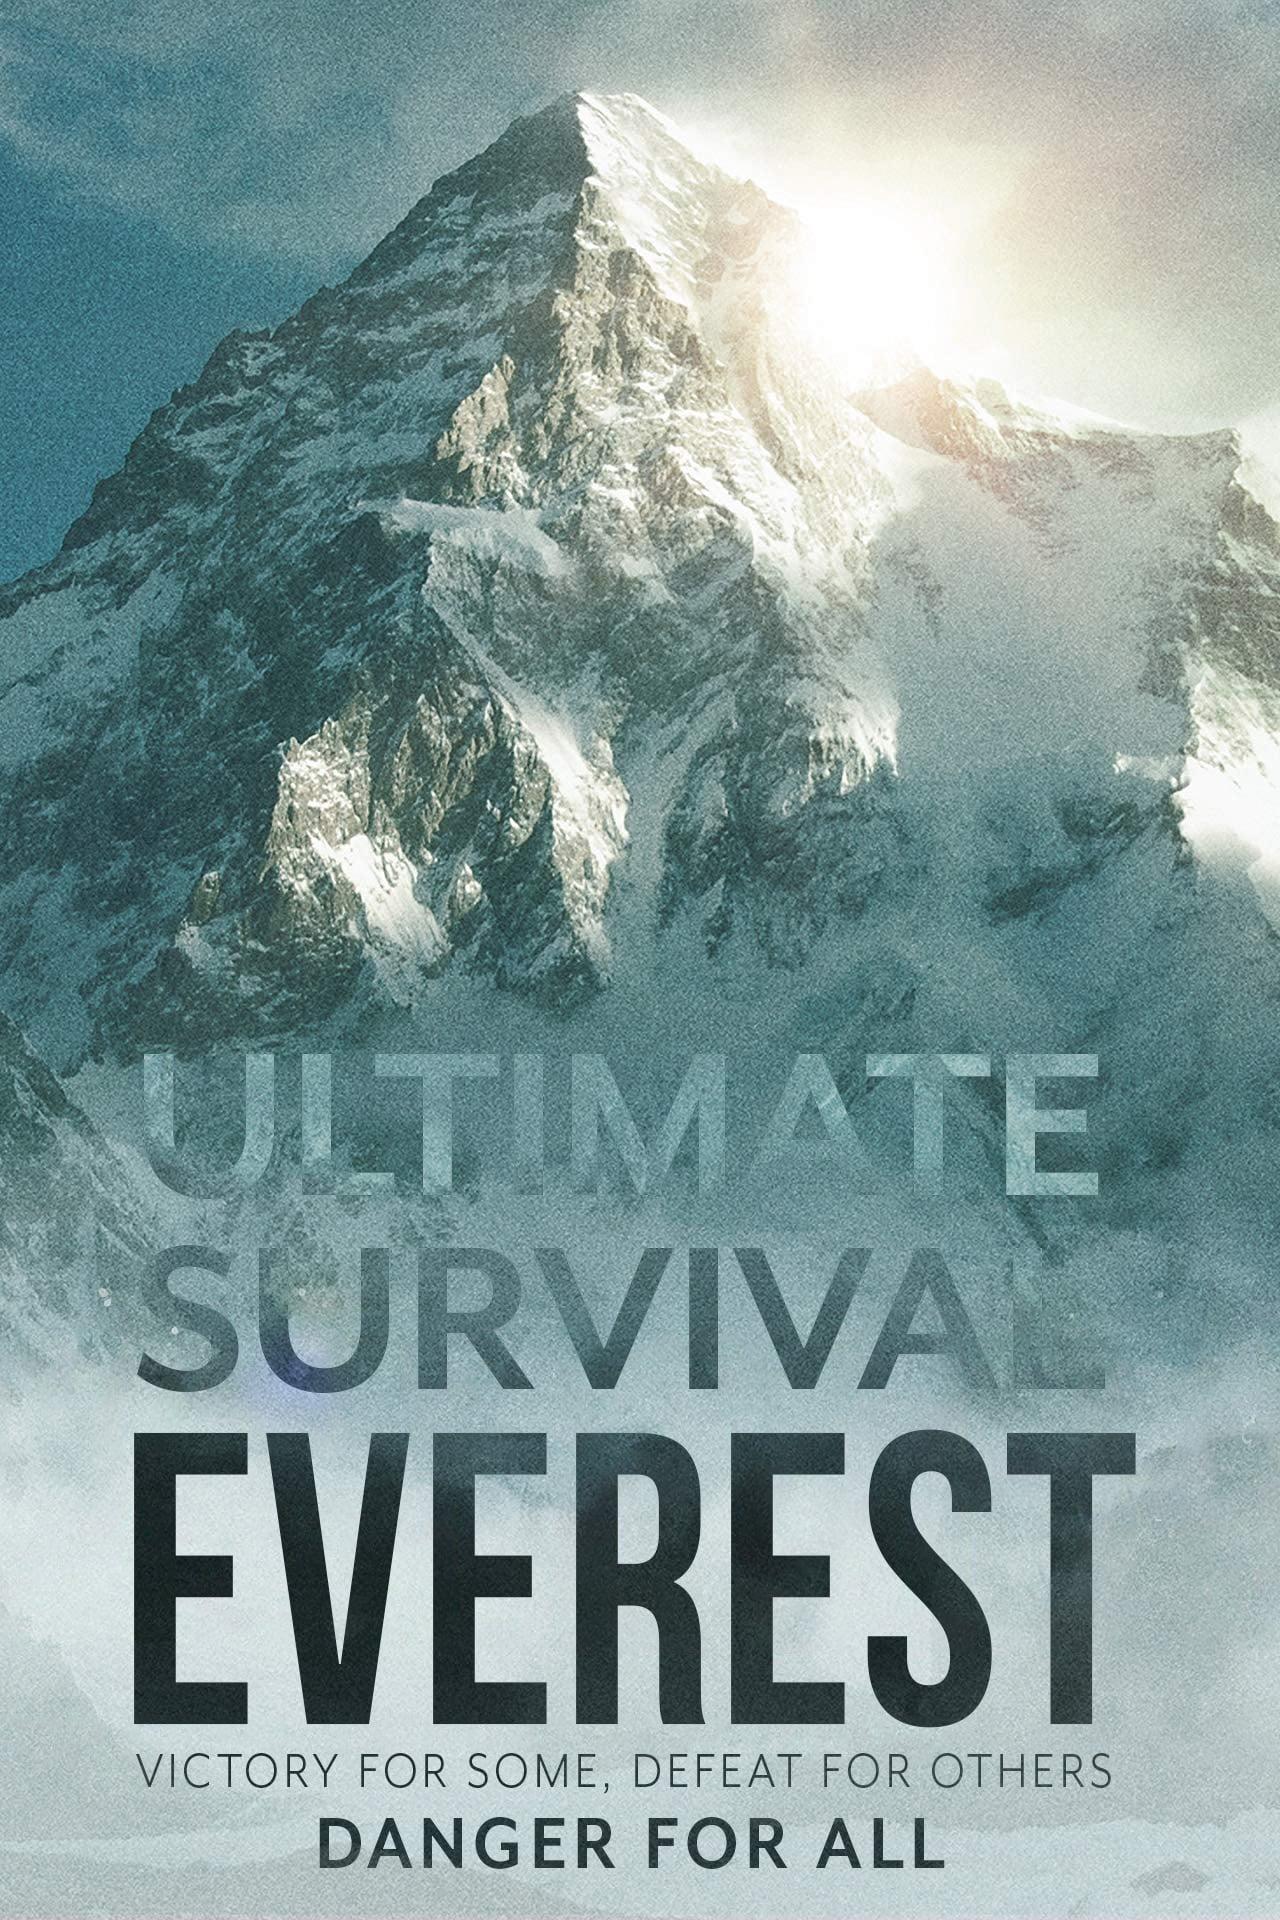 Ultimate Survival: Everest (2004)